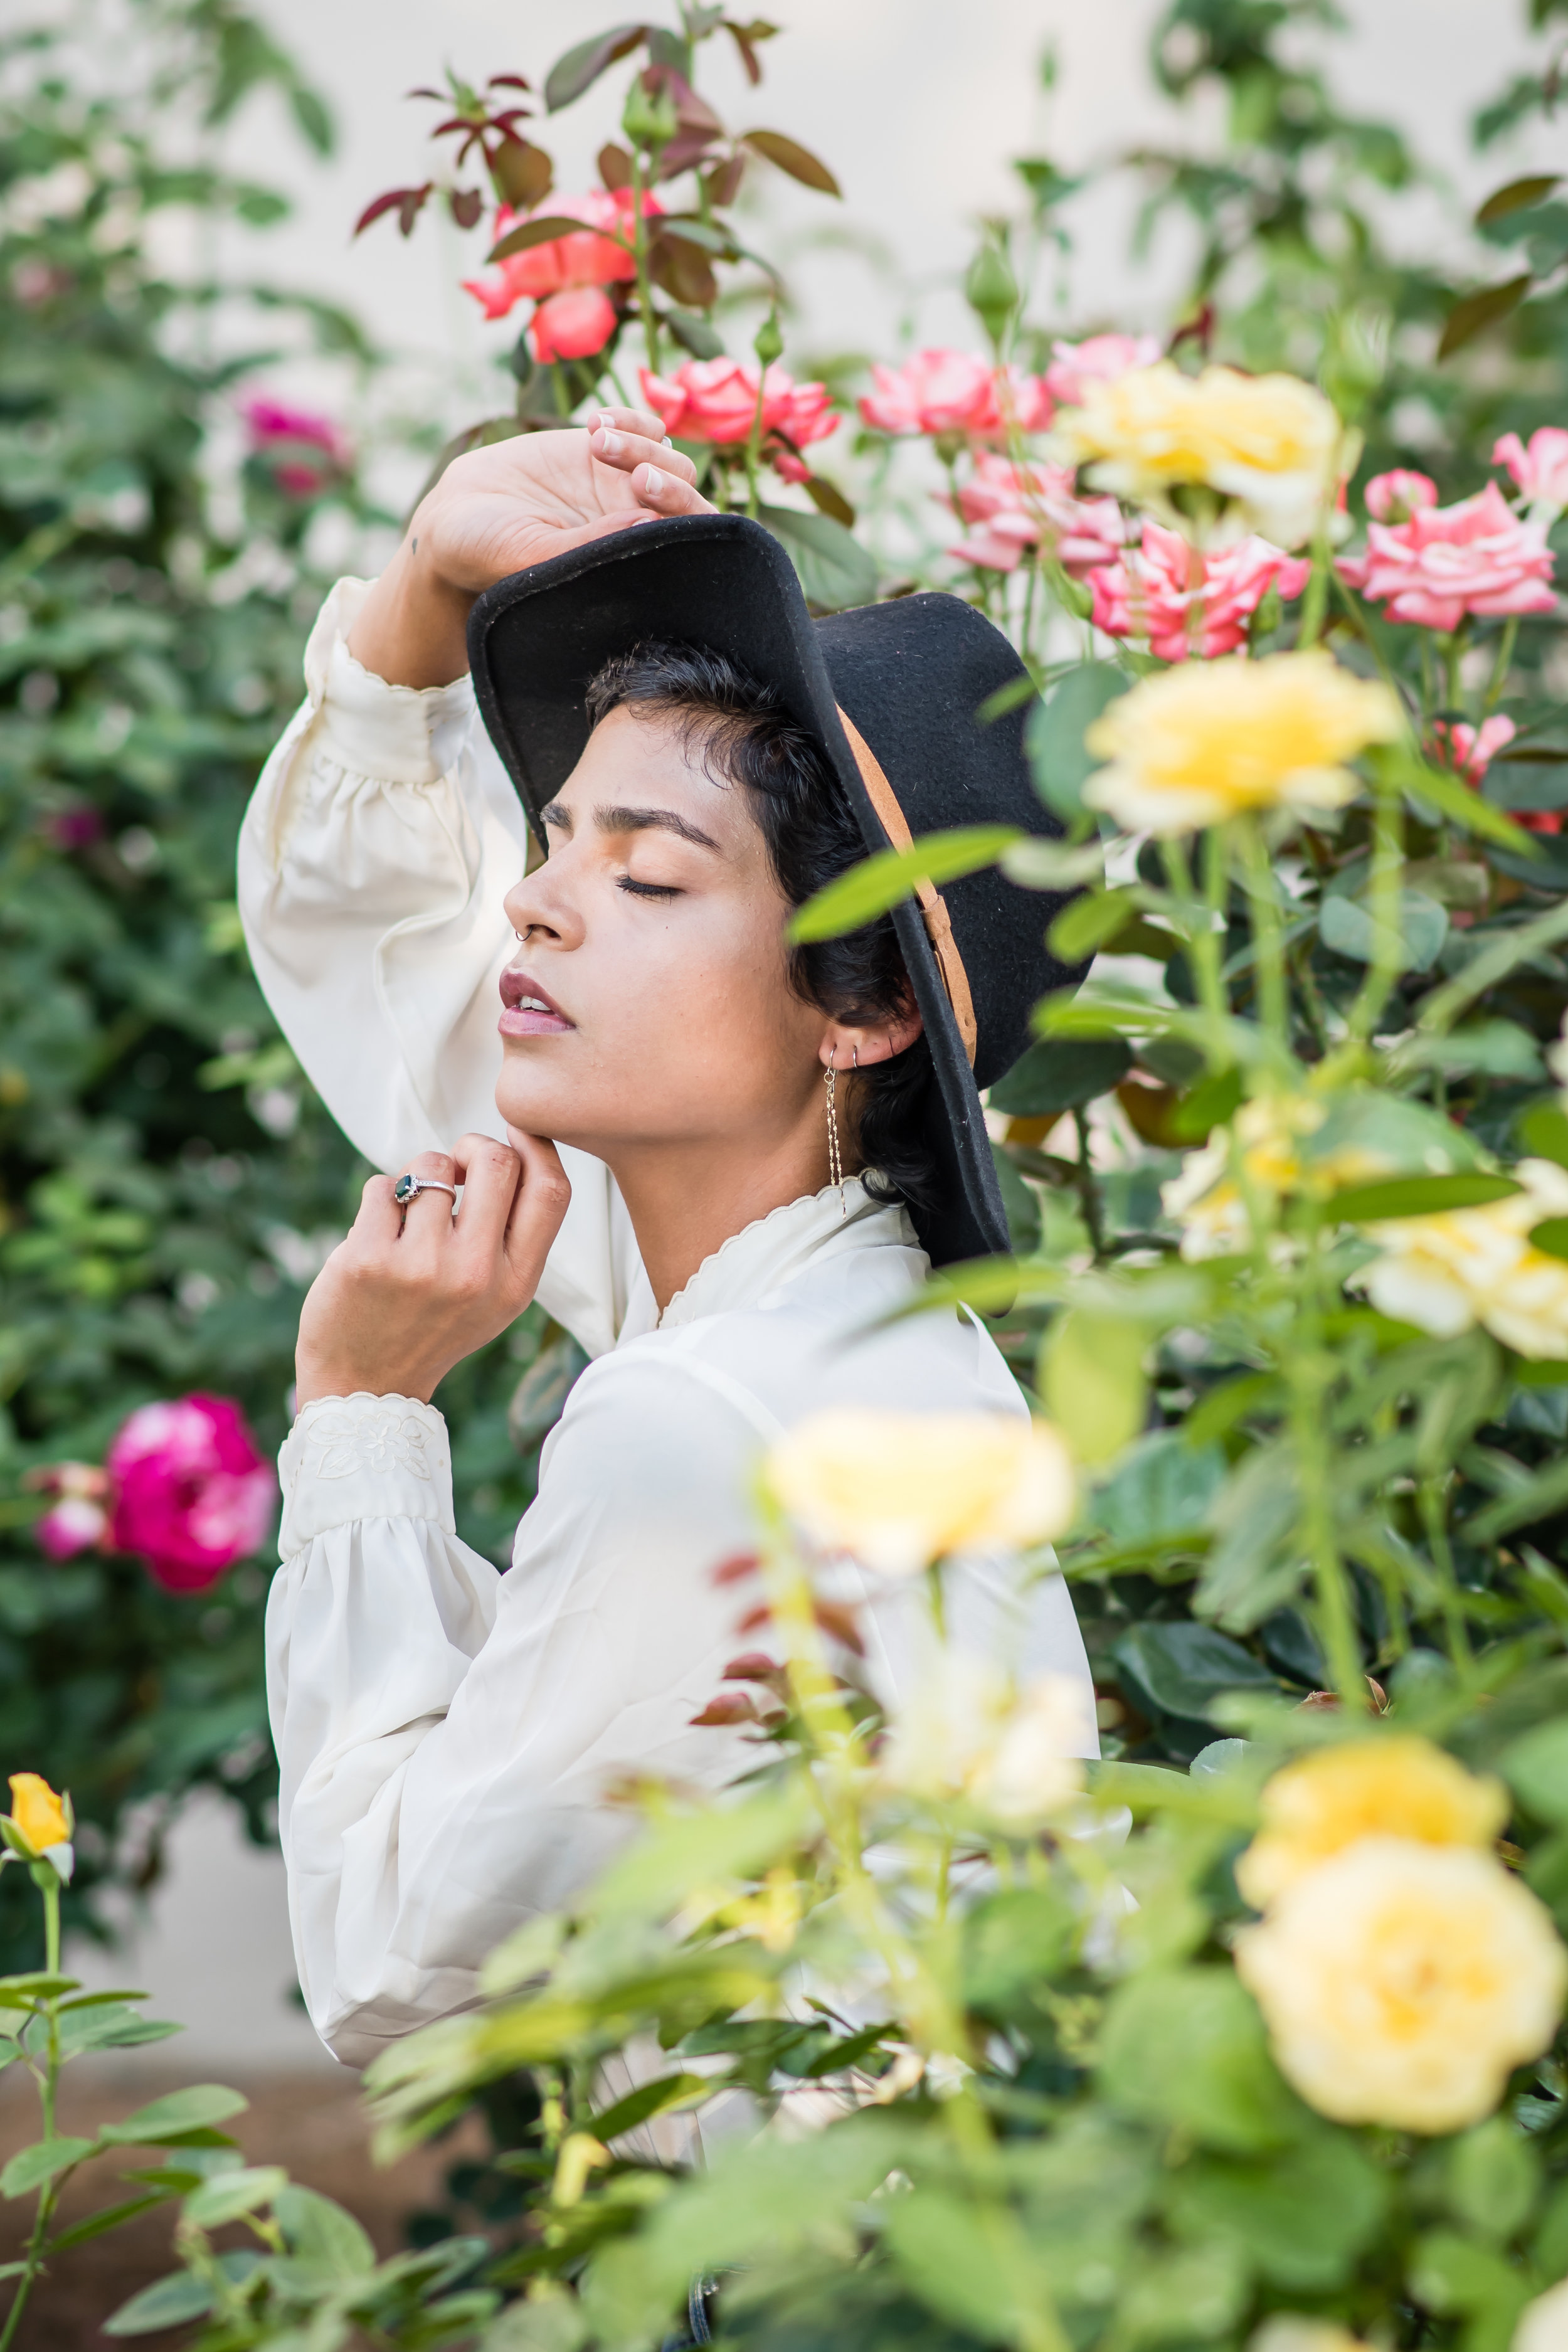 bohemian portrait session Orlando Photographer Yanitza Ninett Top 10 fashion photographers